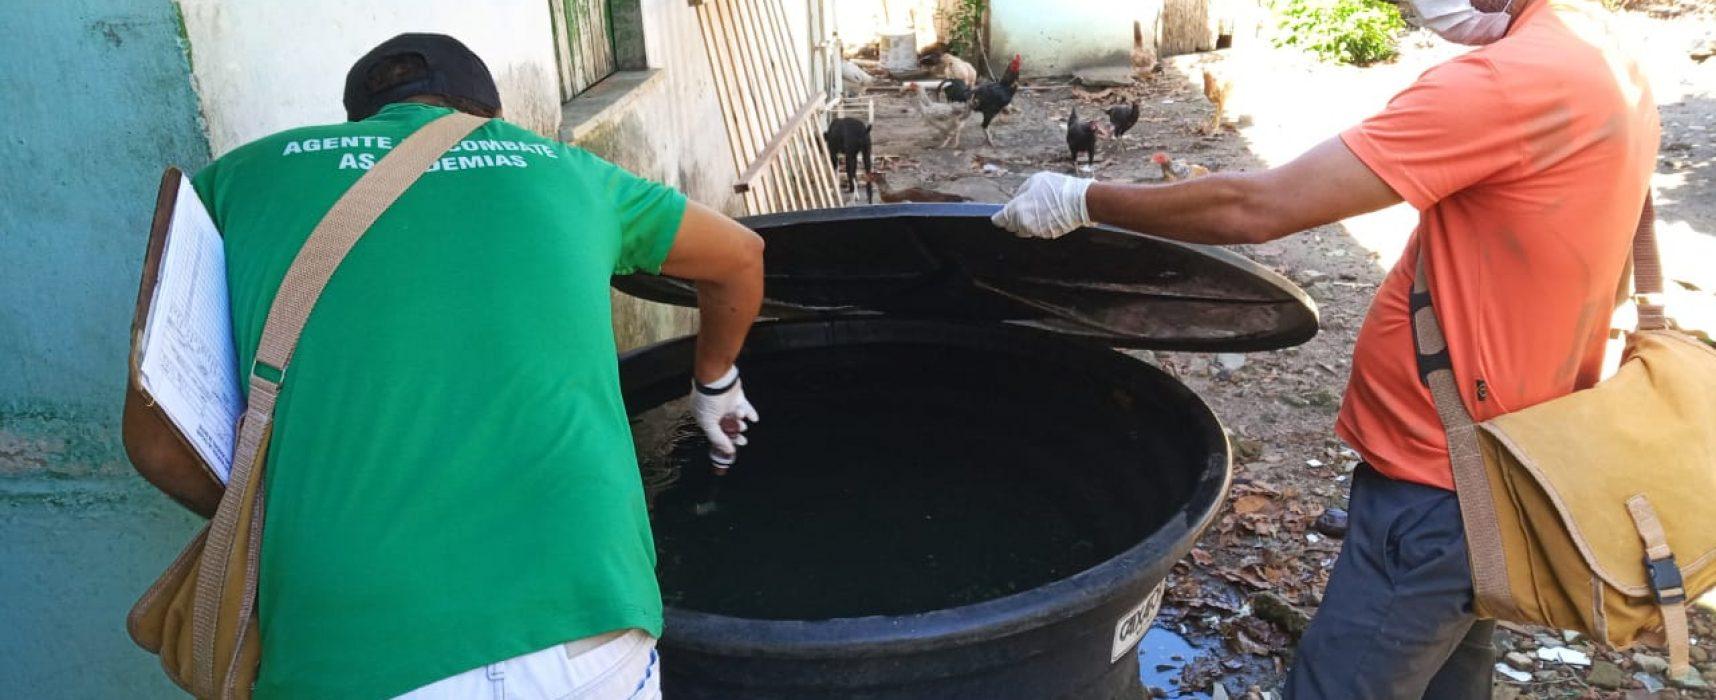 Prefeitura de Itacaré intensifica campanha de combate à dengue nos bairros e distritos